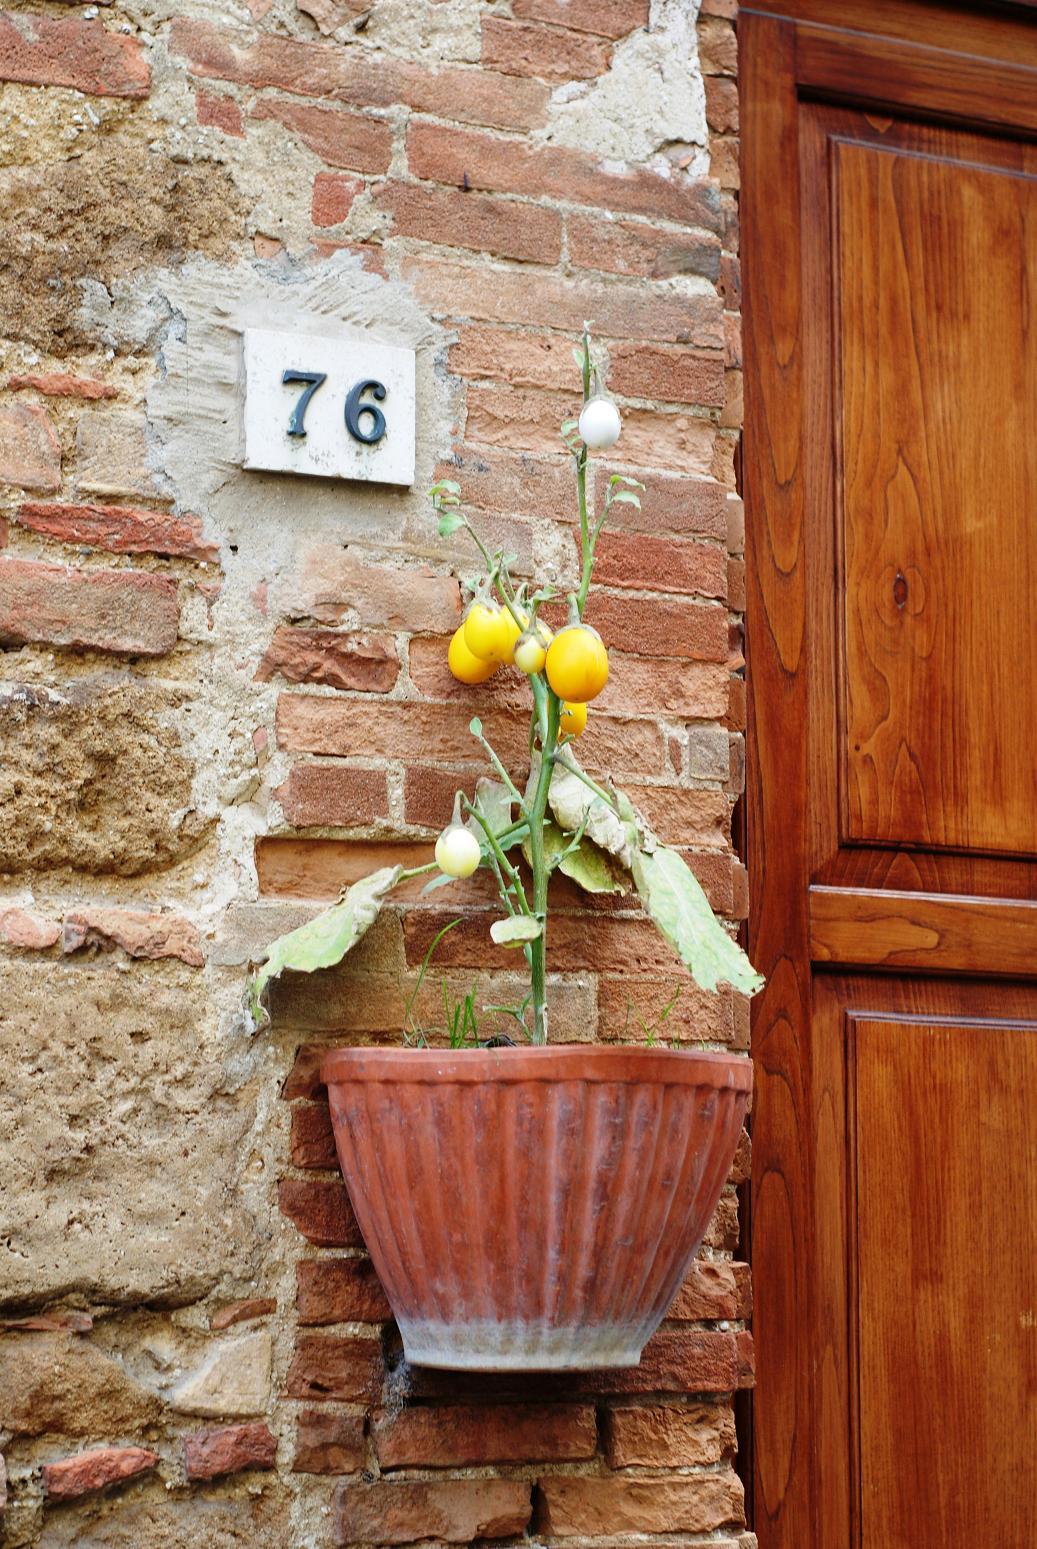 & March bread: Tuscan Doorways